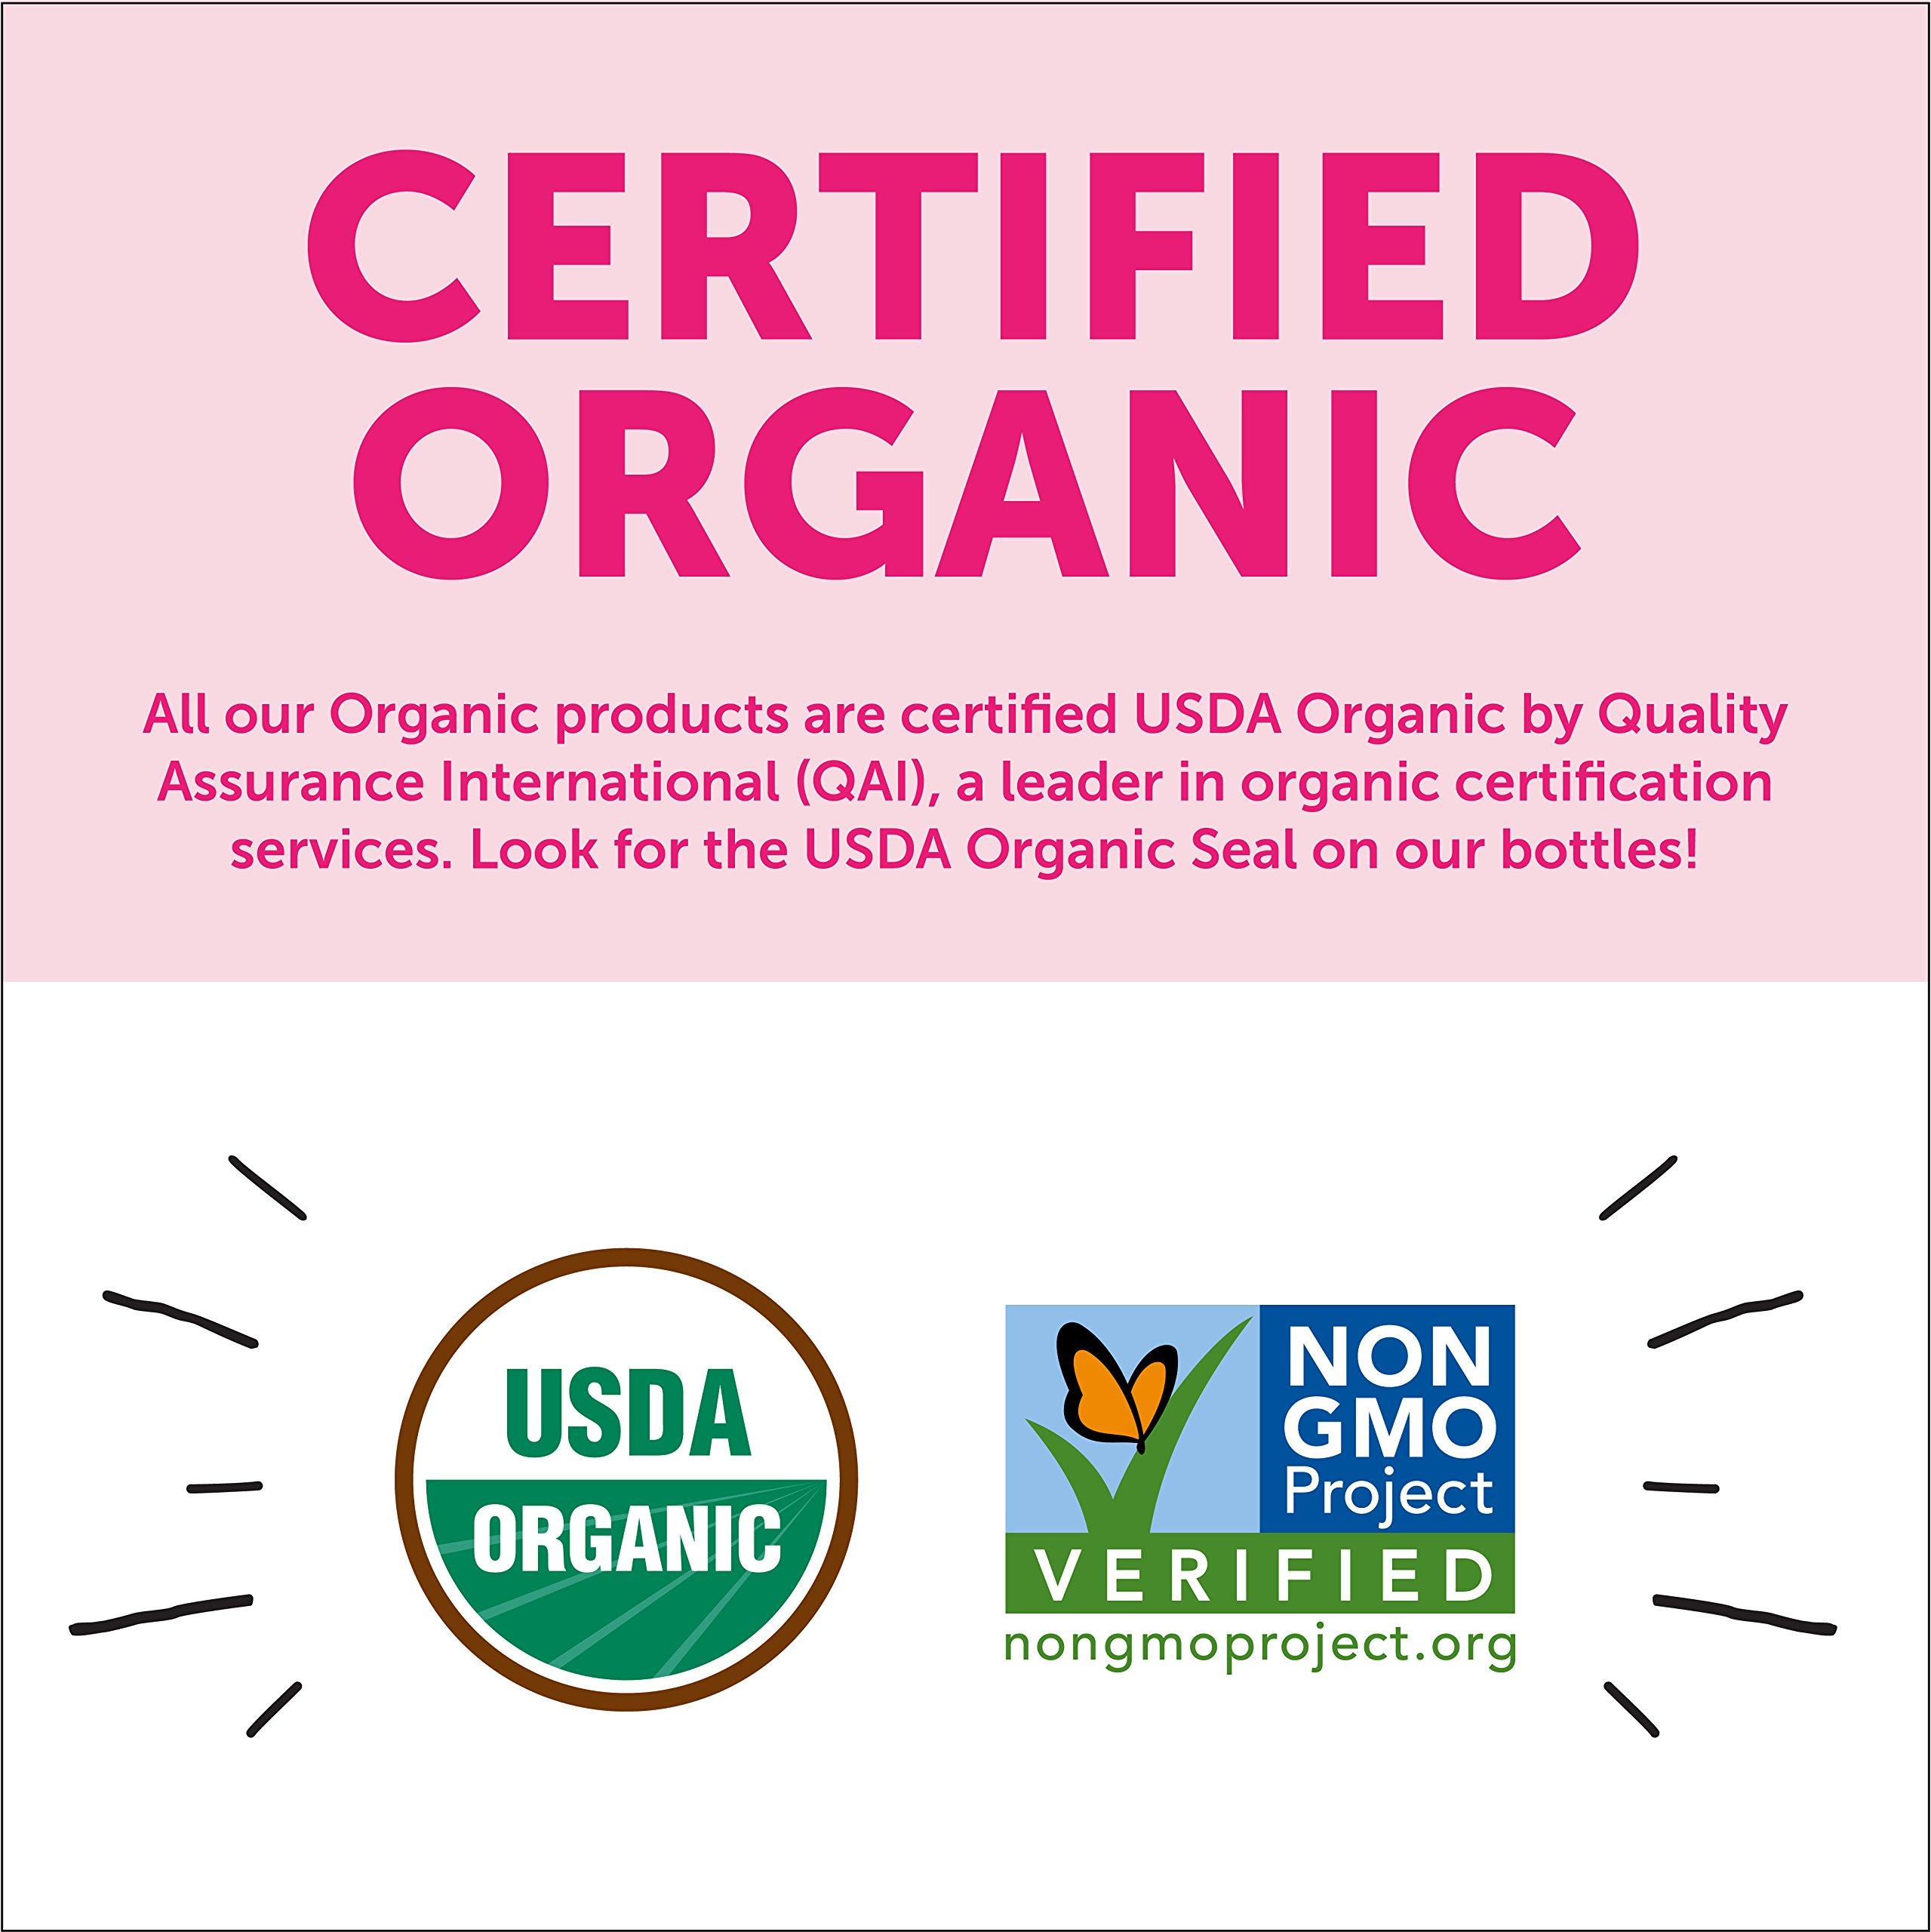 SmartyPants Vegetarian Organic Kids Daily Gummy Vitamins: Multivitamin, Gluten Free, Non-GMO, Omega-3, Probiotic, Vitamin D3, Methylcobalamin B12, Zinc; 120 Count (30 Day Supply) by SmartyPants Vitamins (Image #7)